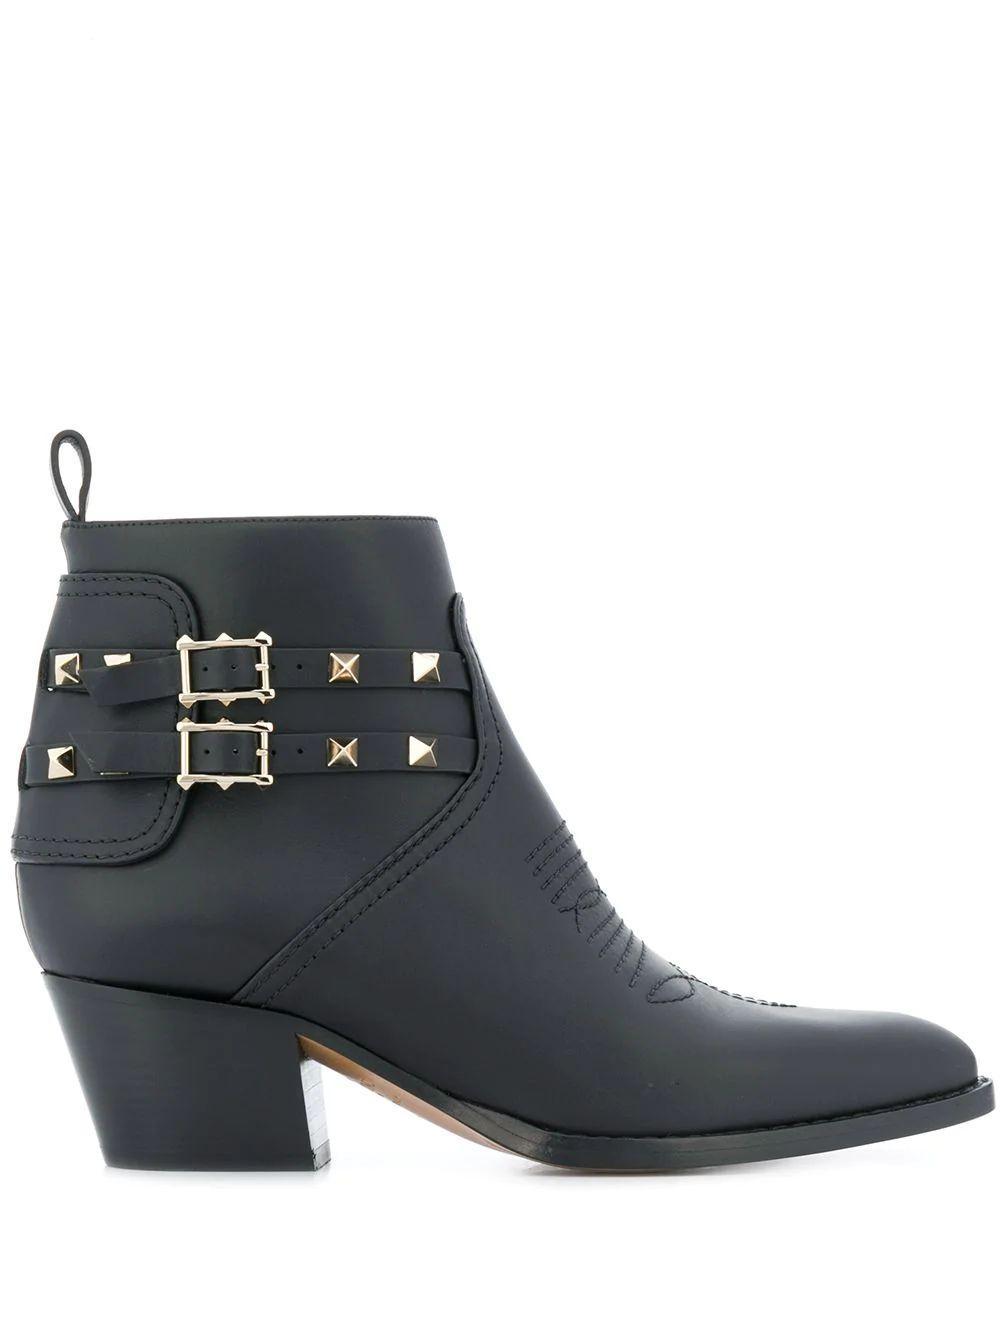 Pointed Toe 50mm Black Heel Bootie Item # SW0S0S04VXS